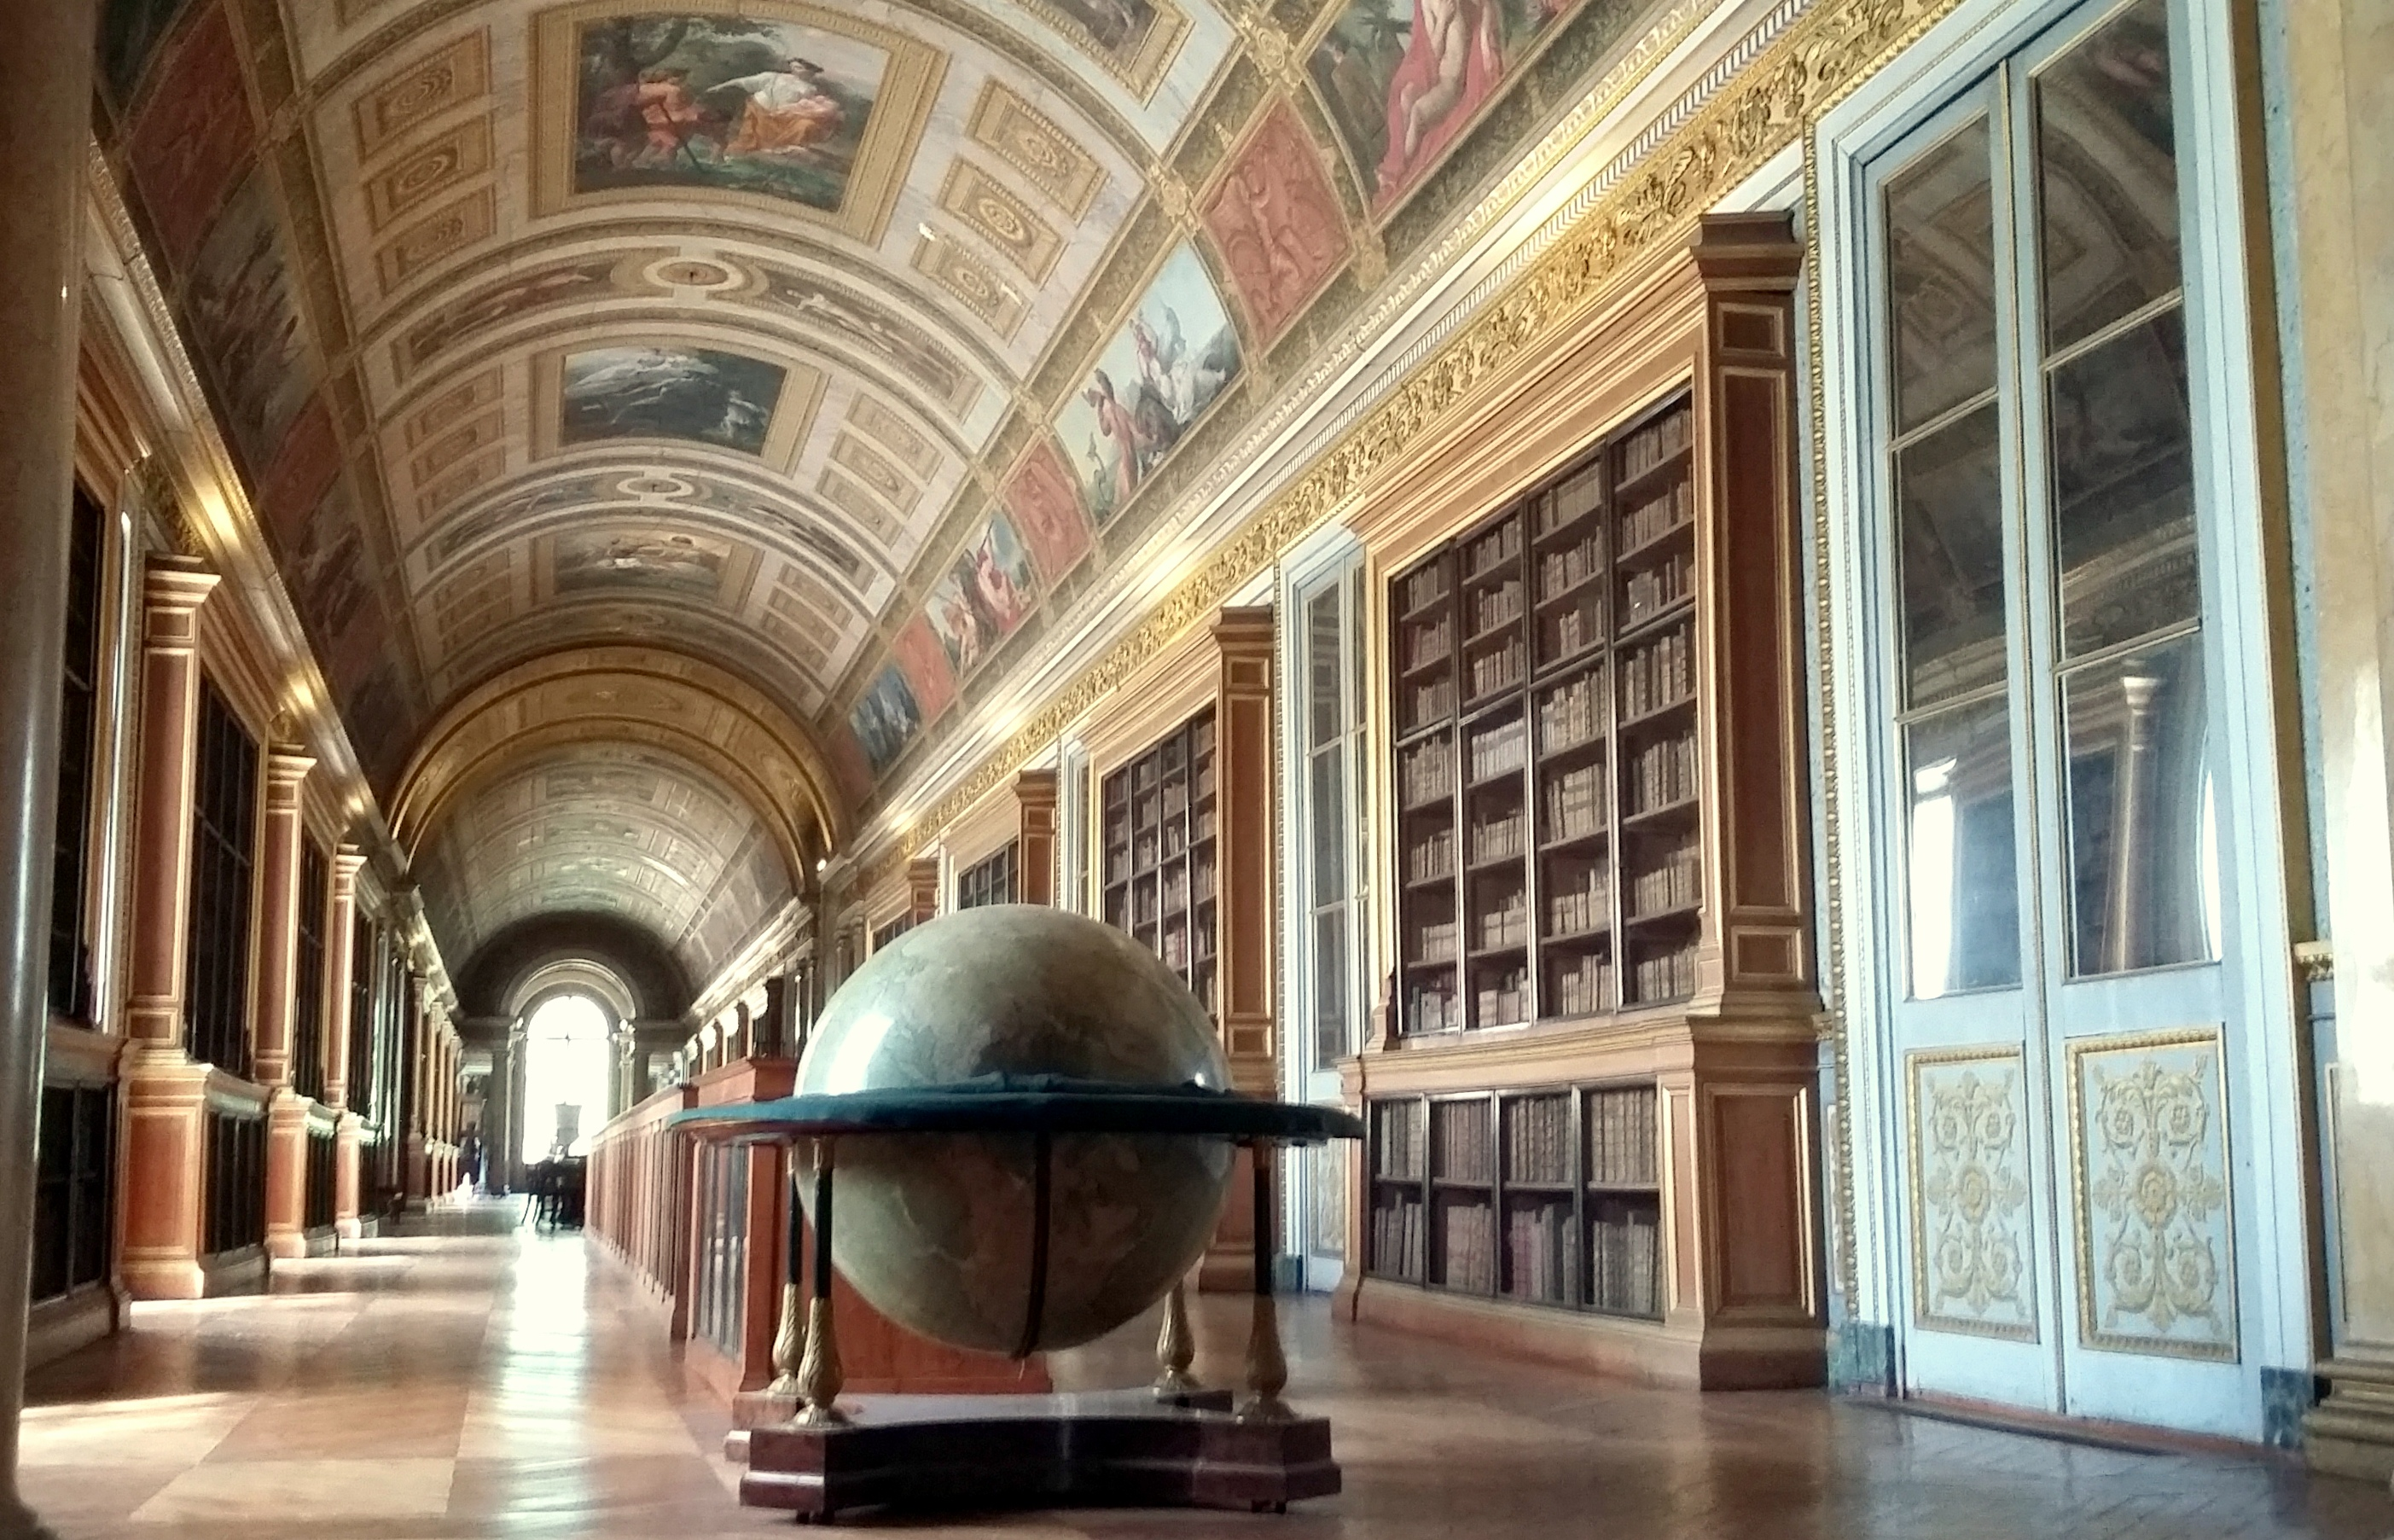 Diana Gallery, Chateau de Fontainebleau